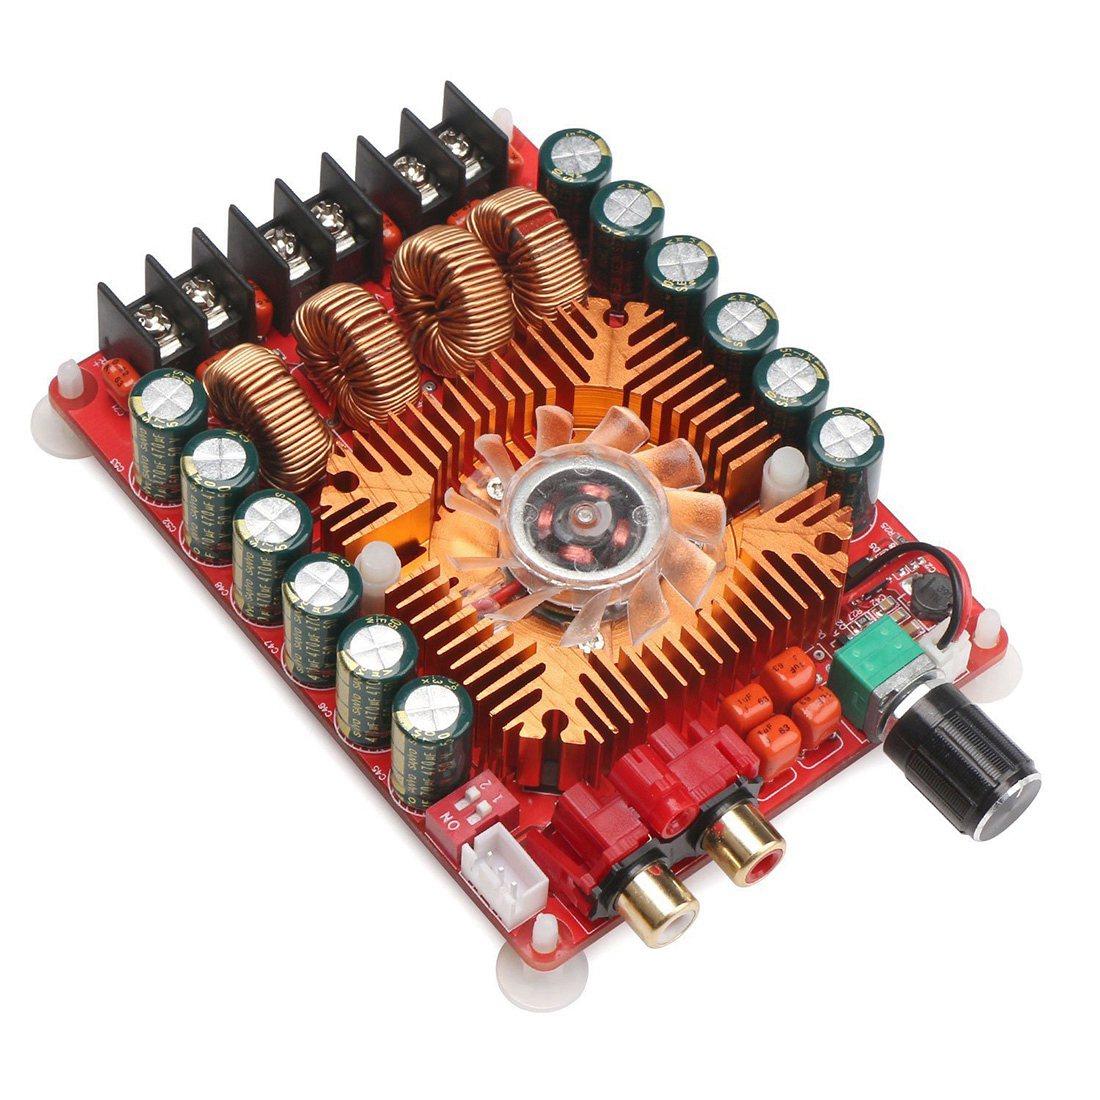 TDA7498E 2X160W Dual Channel Audio Amplifier Board, Support BTL Mode 1X220W Single Channel, DC 24V Digital Stereo Power Amp